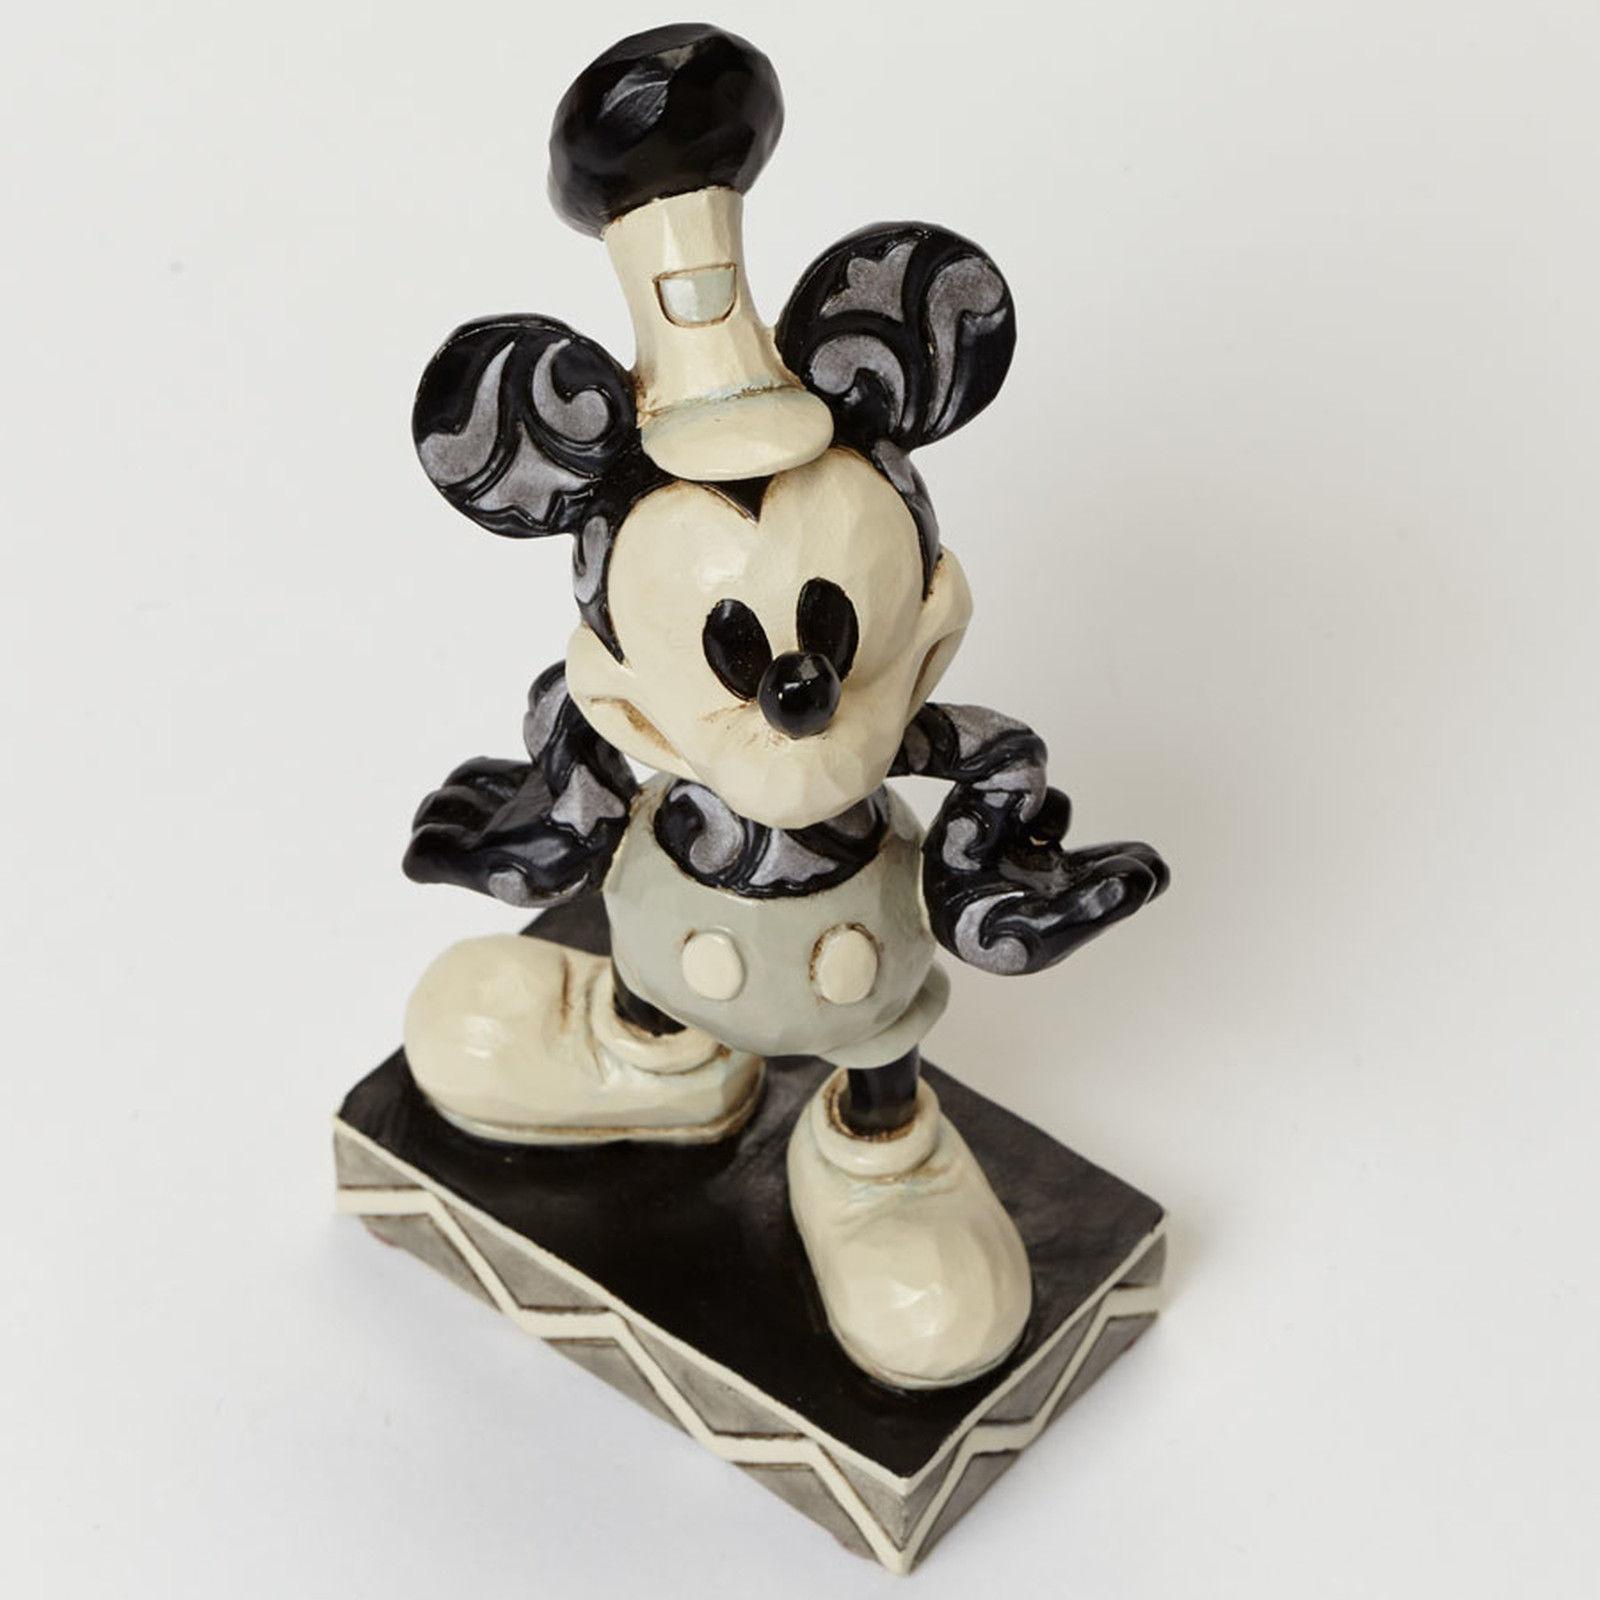 Jim Shore Steamboat Wille Figurine Pose The Original 4045245 Disney Traditions